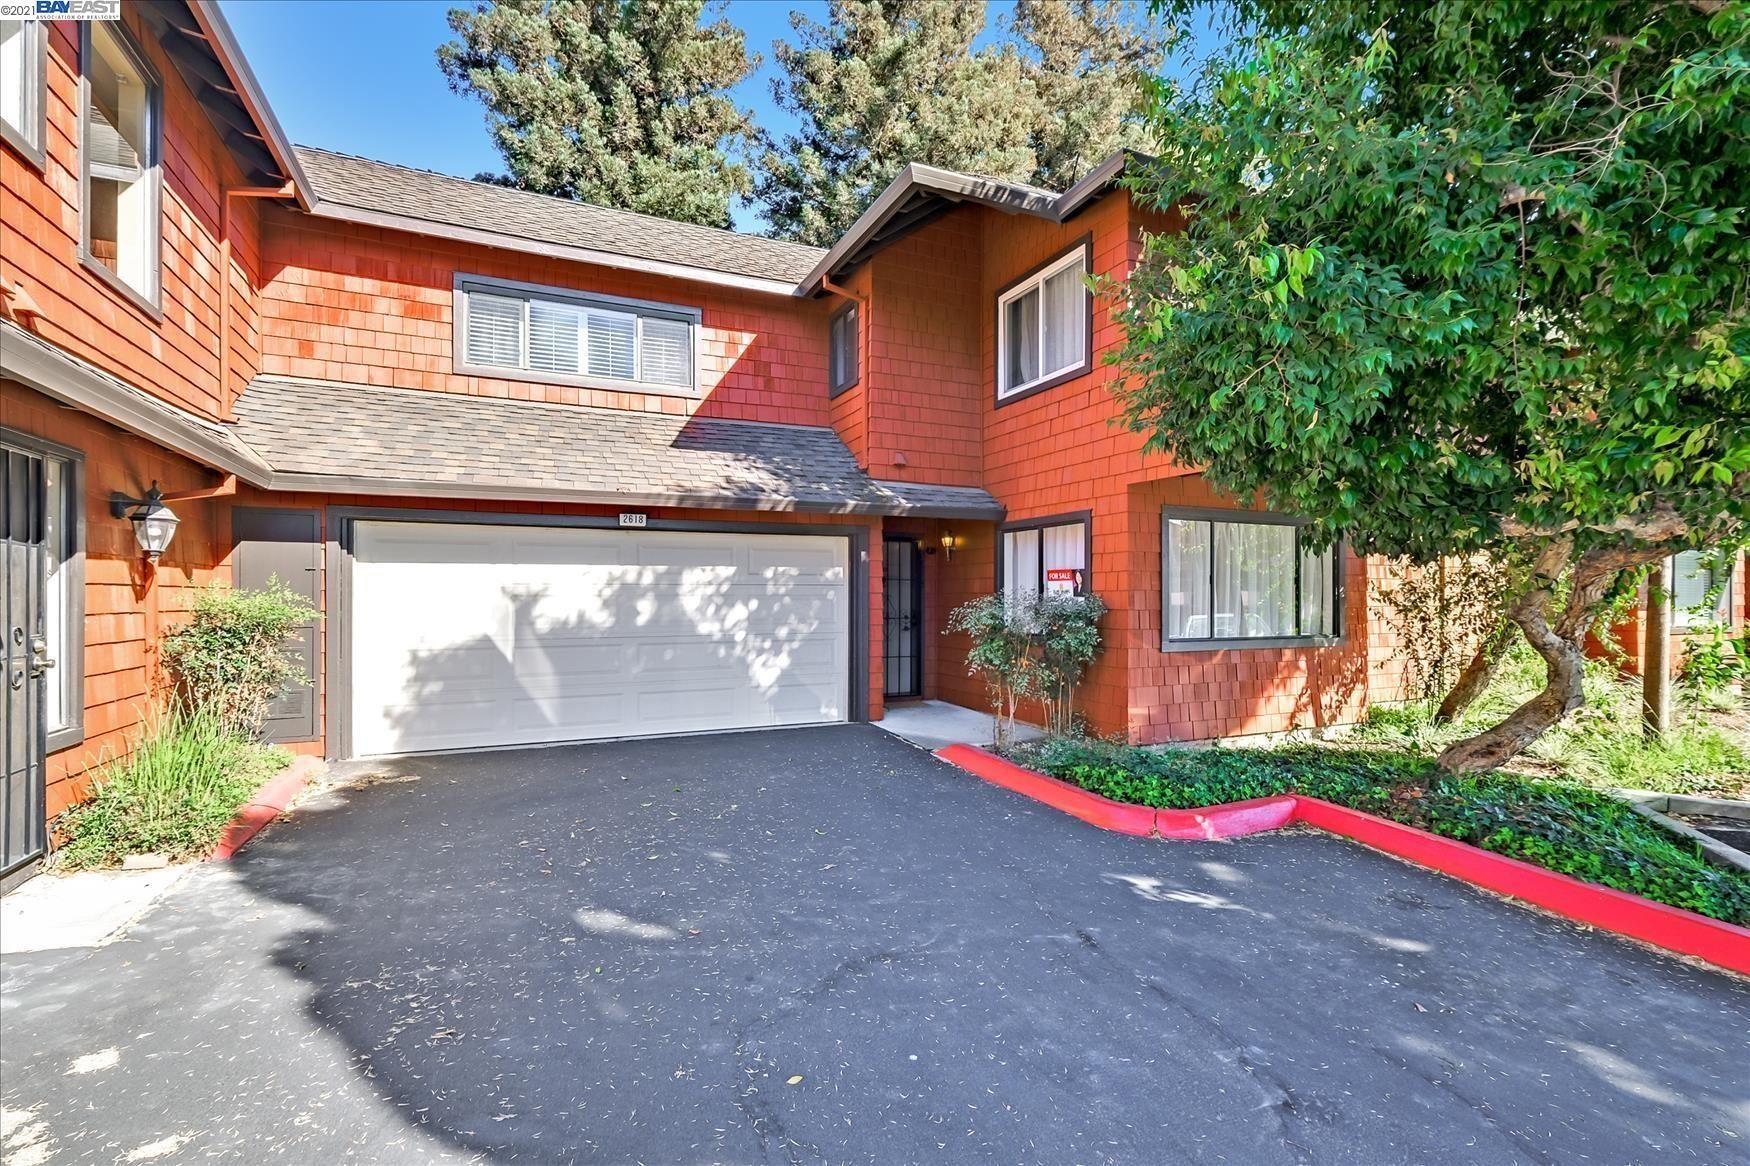 2618 Village Ct, Union City, CA 94587 - #: 40967717